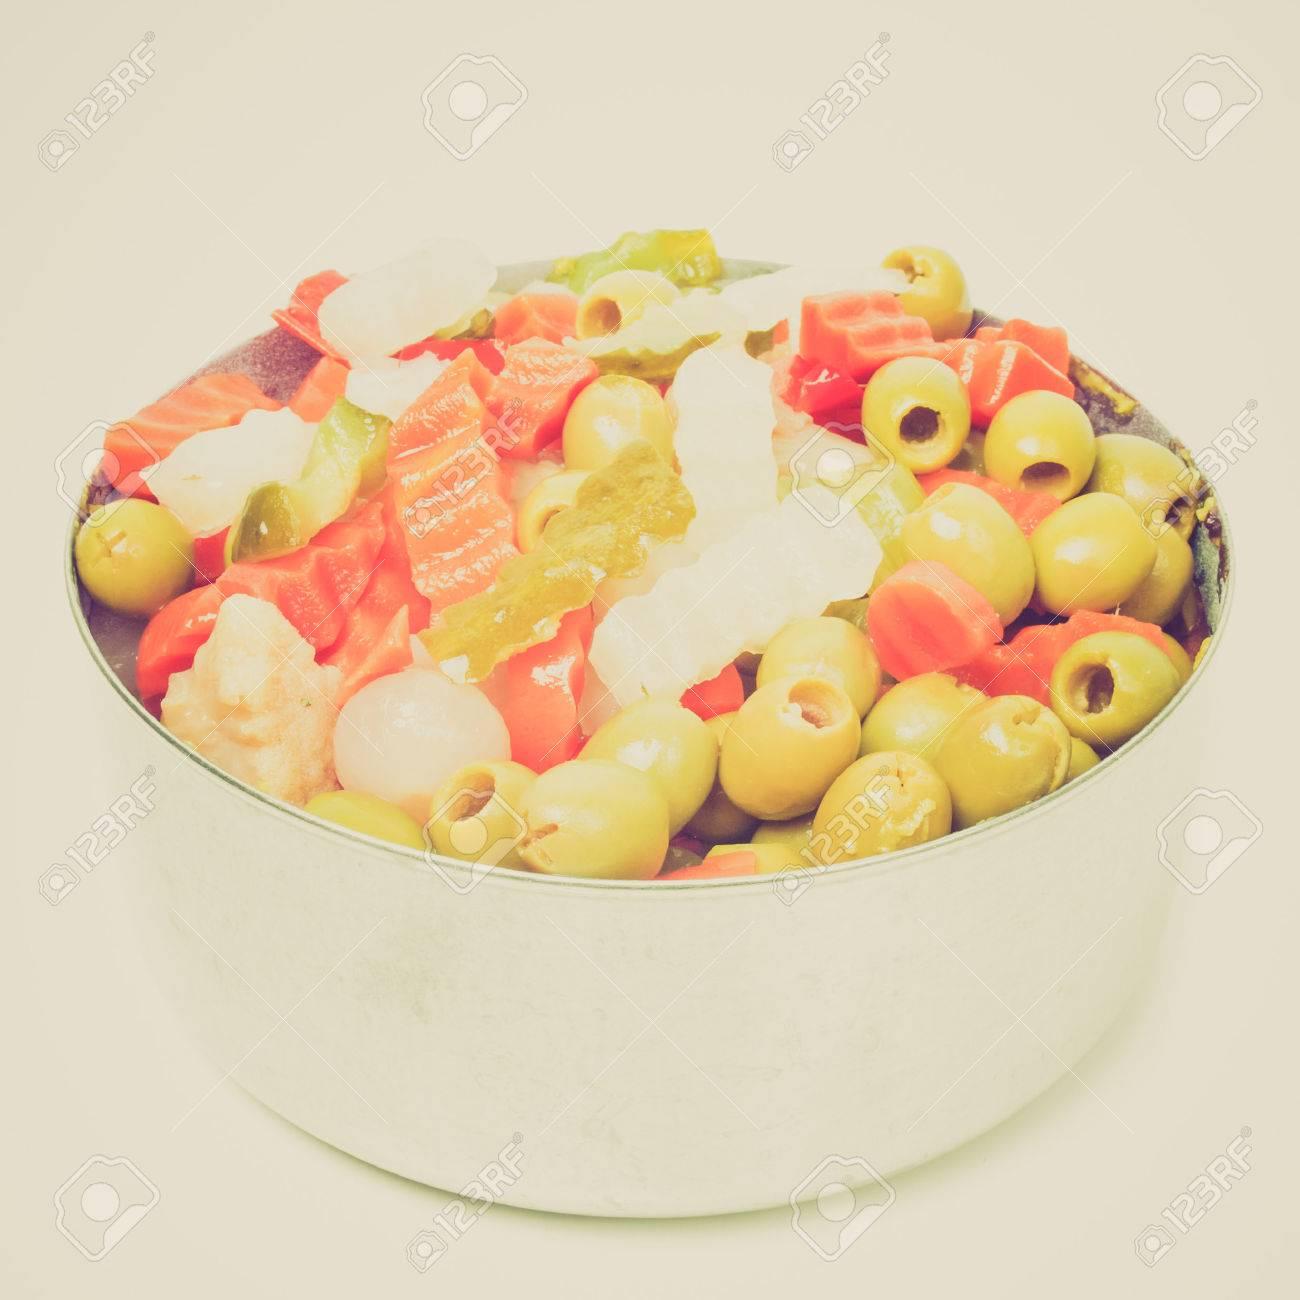 Cru Regardant Des Legumes Melanges Employe Dans Salade Russe Y